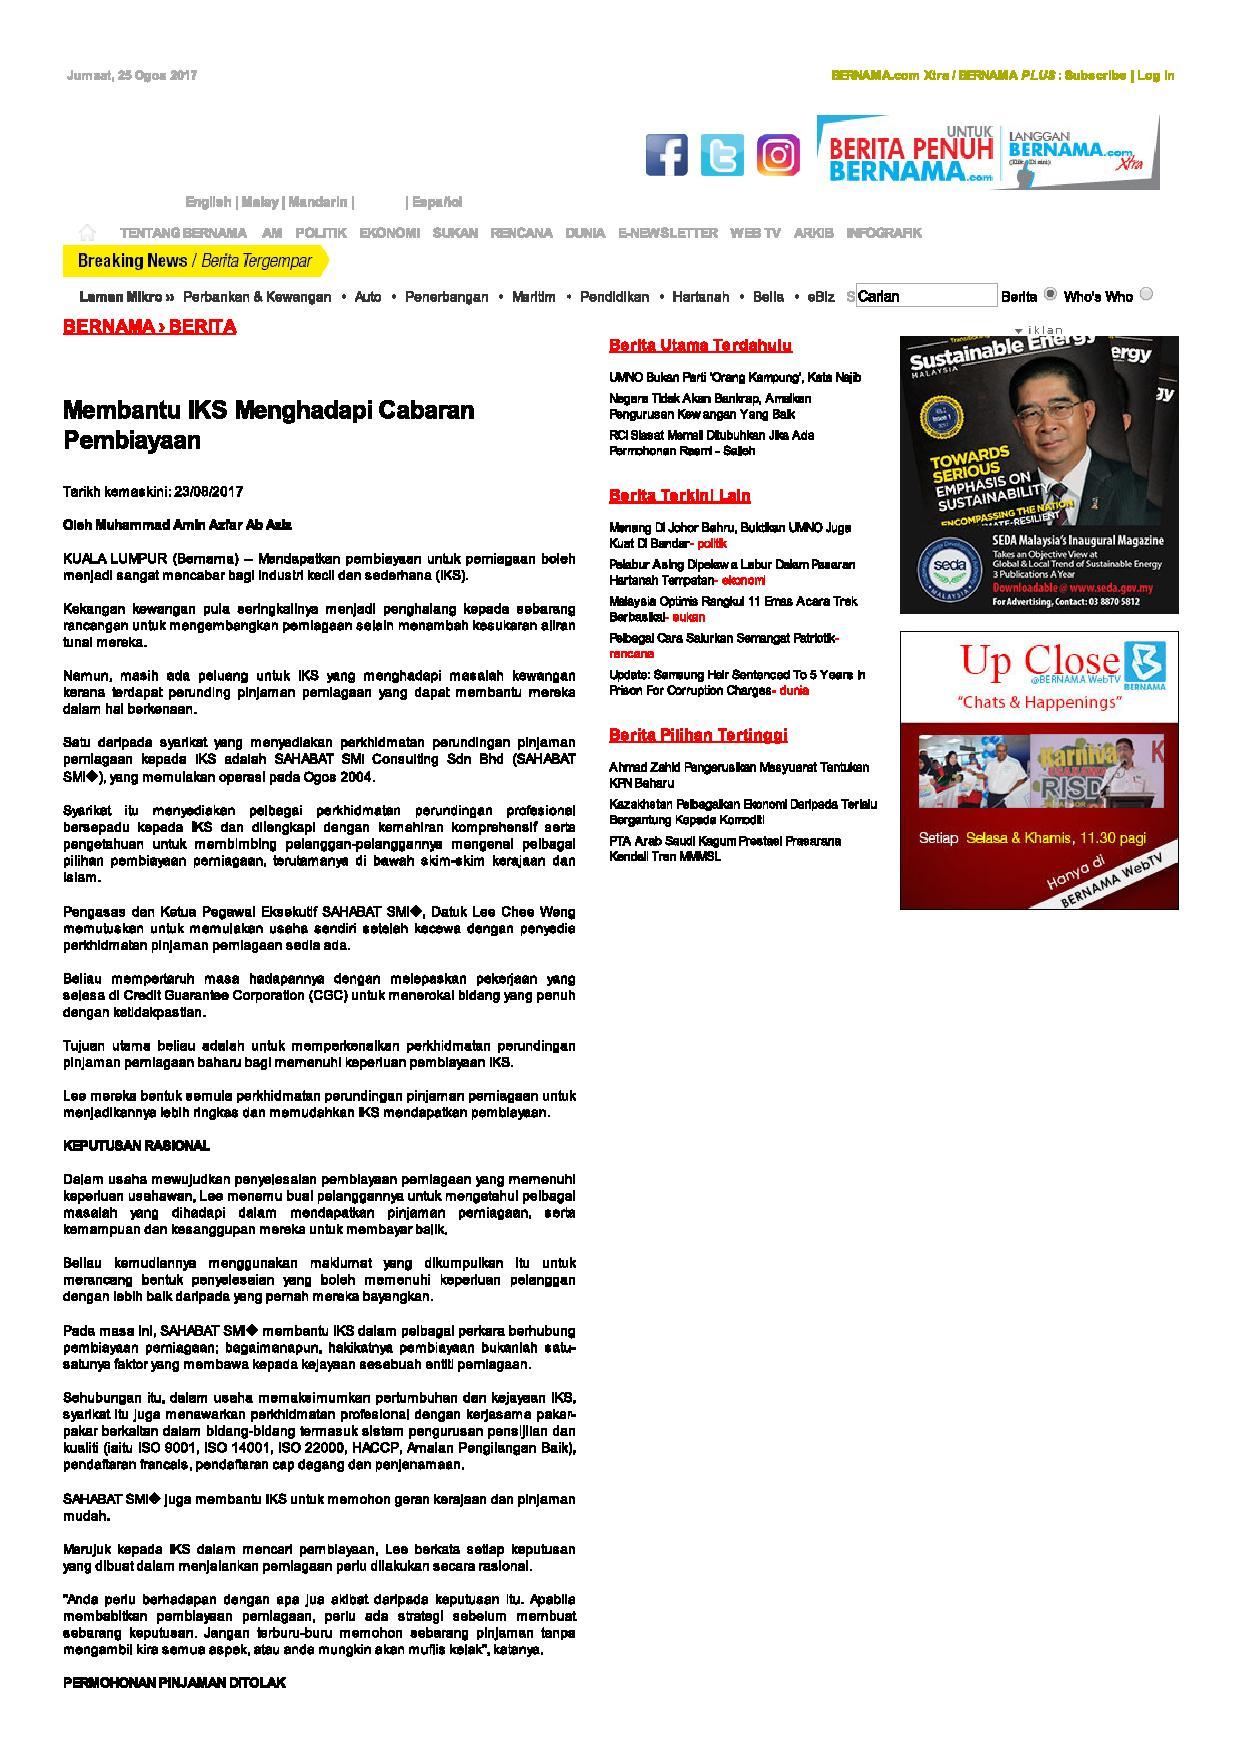 BERNAMA - Membantu IKS Menghadapi Cabaran Pembiayaan-page-001